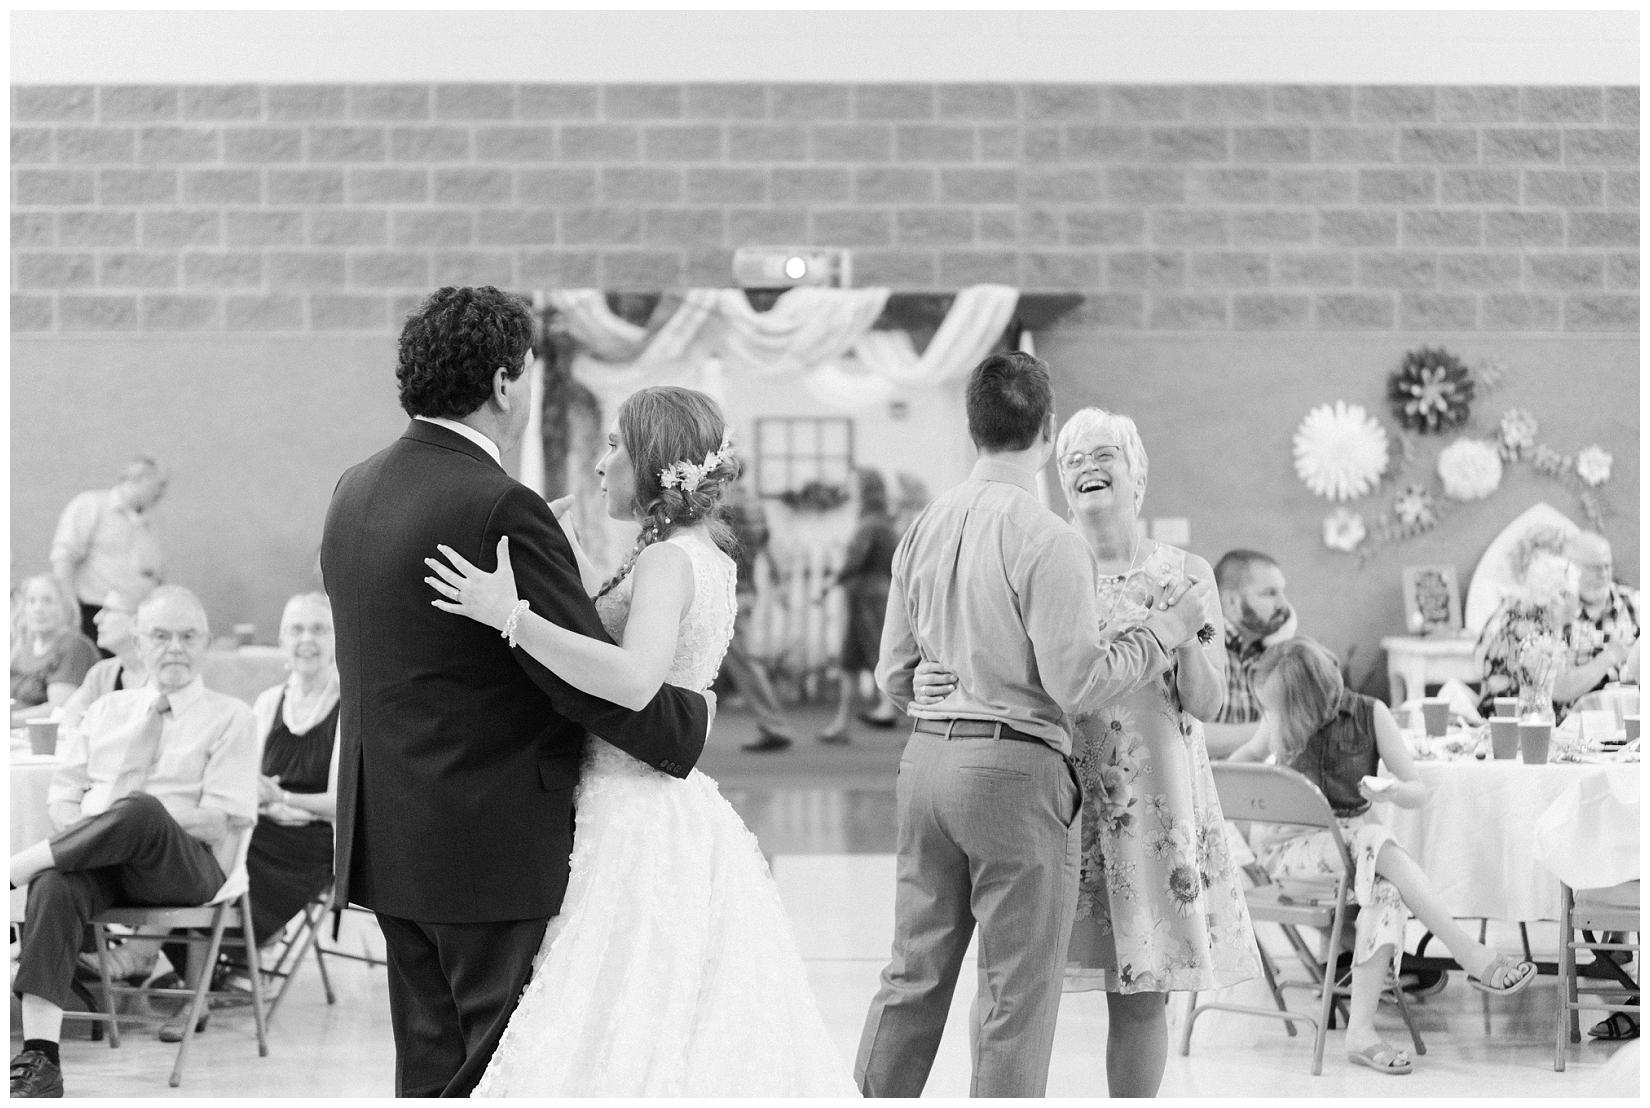 cat-alkire-wedding-photographer-indiana-chicago-indianapolis-fort-wayne_1327.jpg